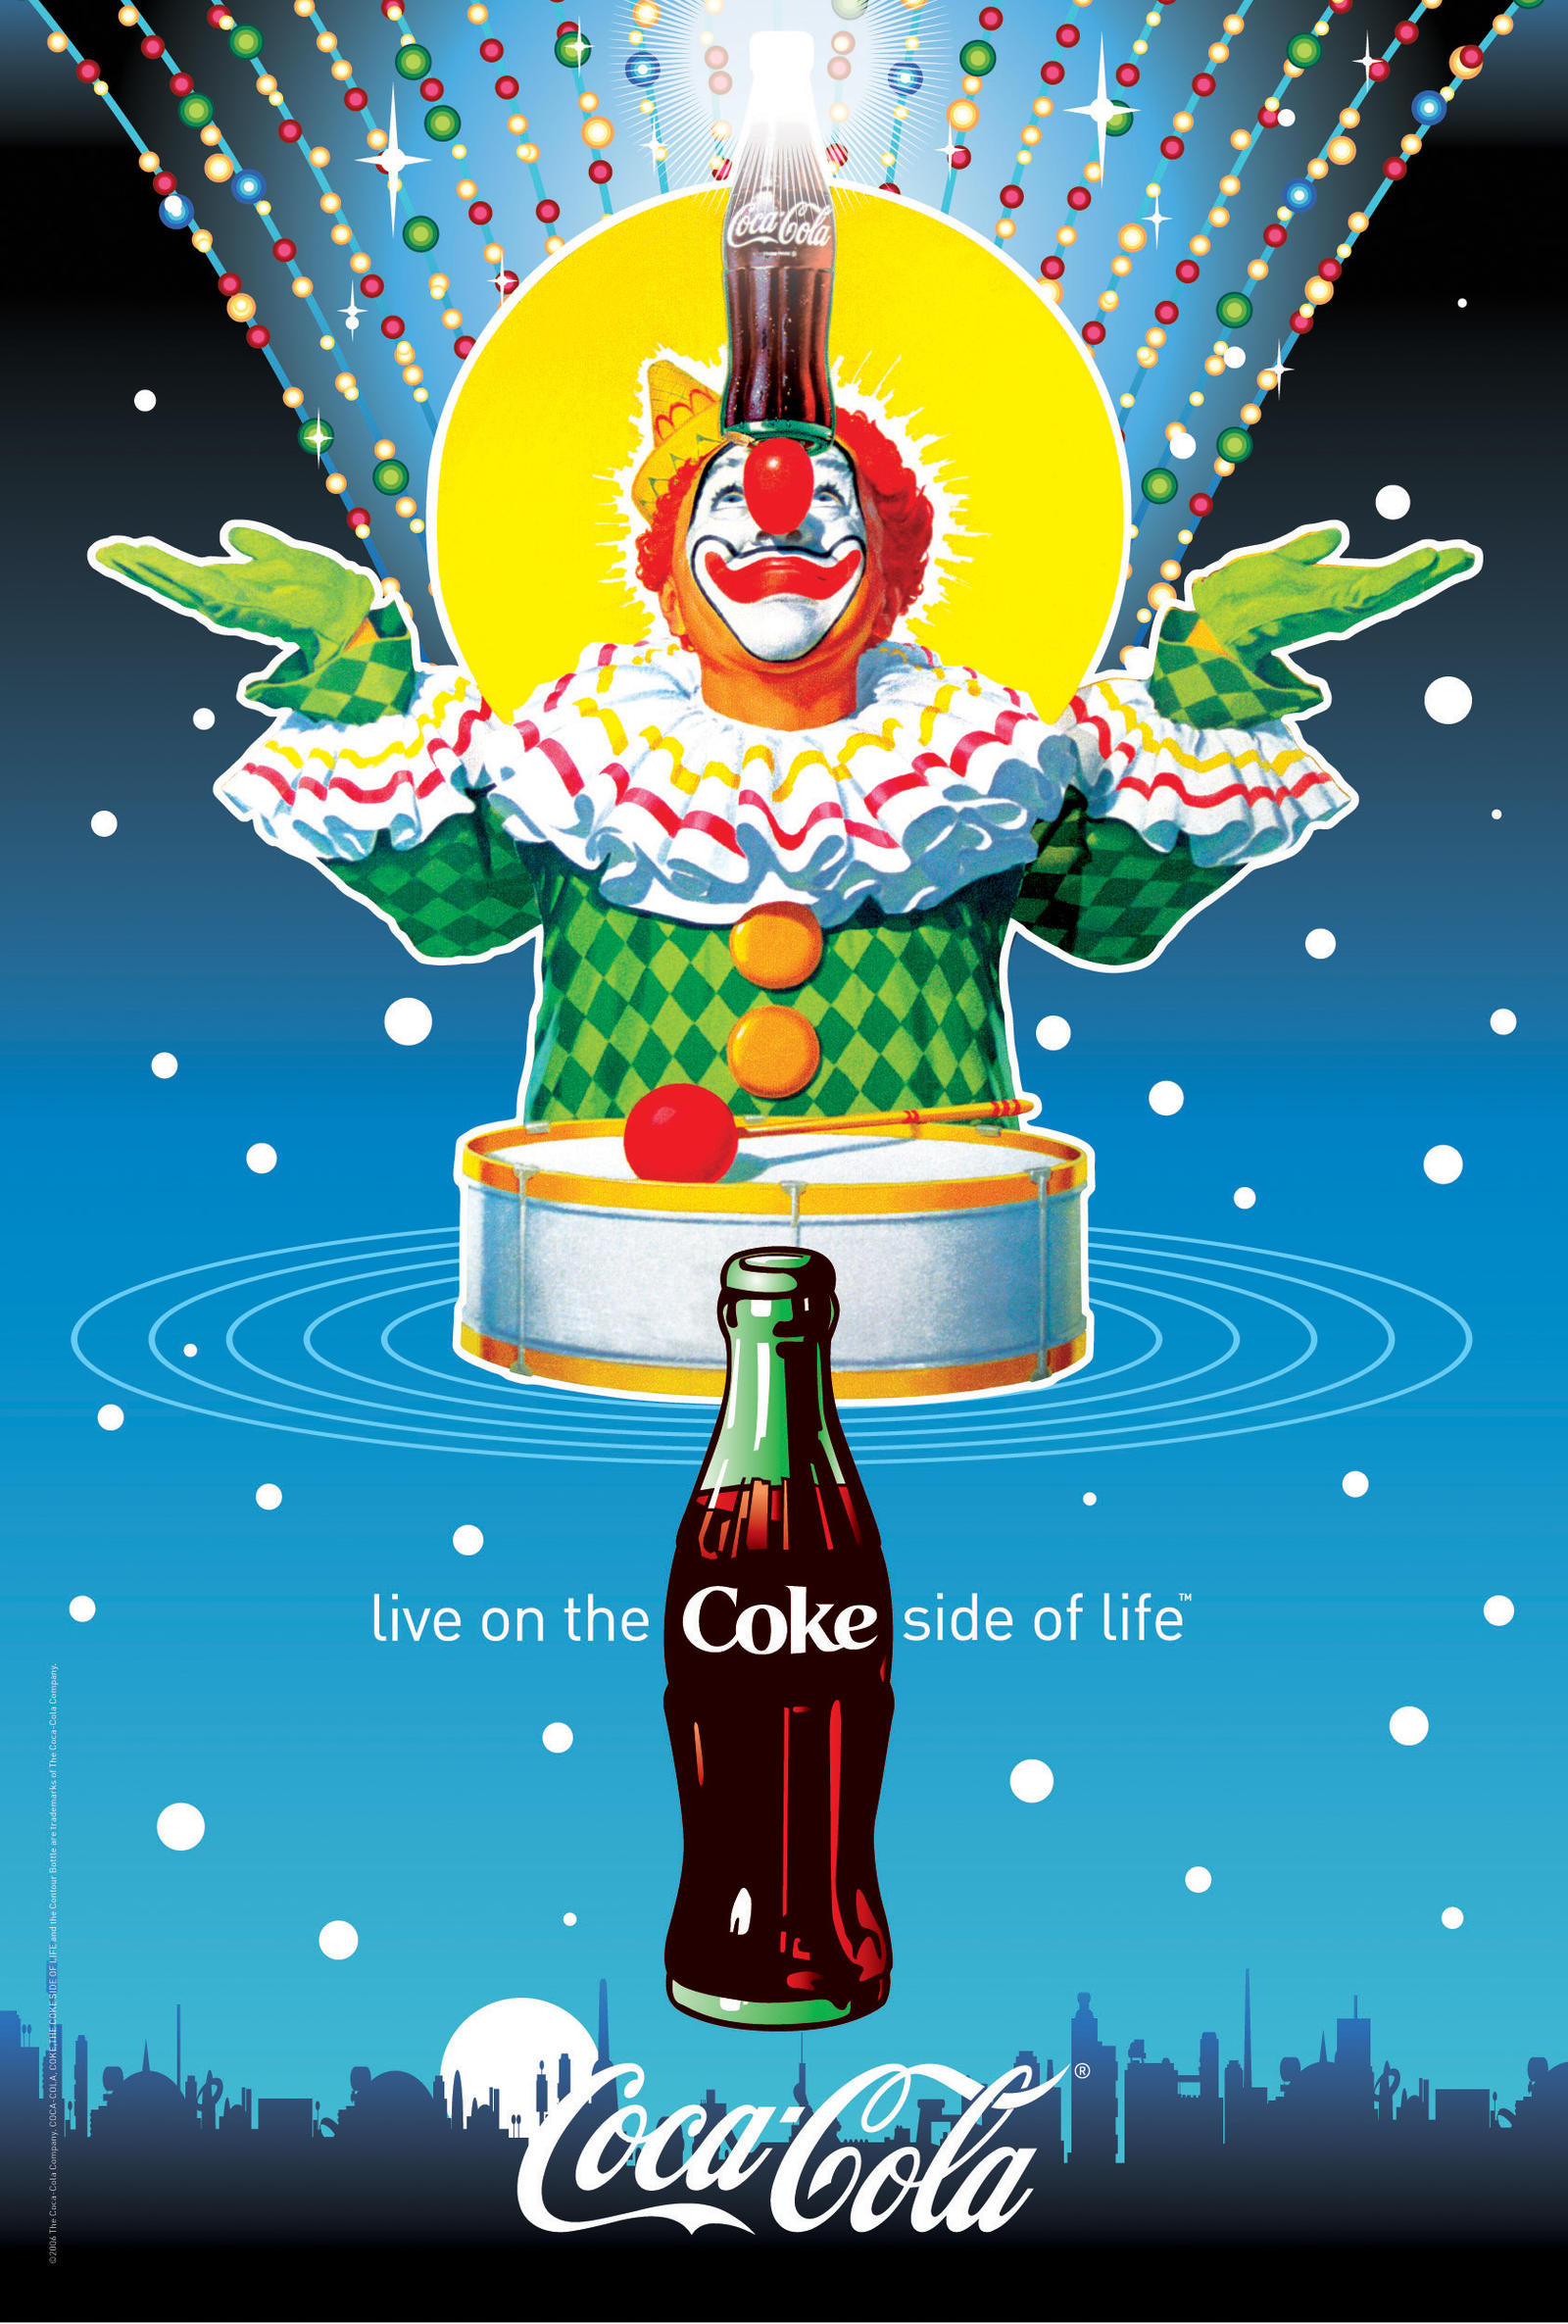 Coca-Cola Circus Poster by Coca-Cola-ArtGallery